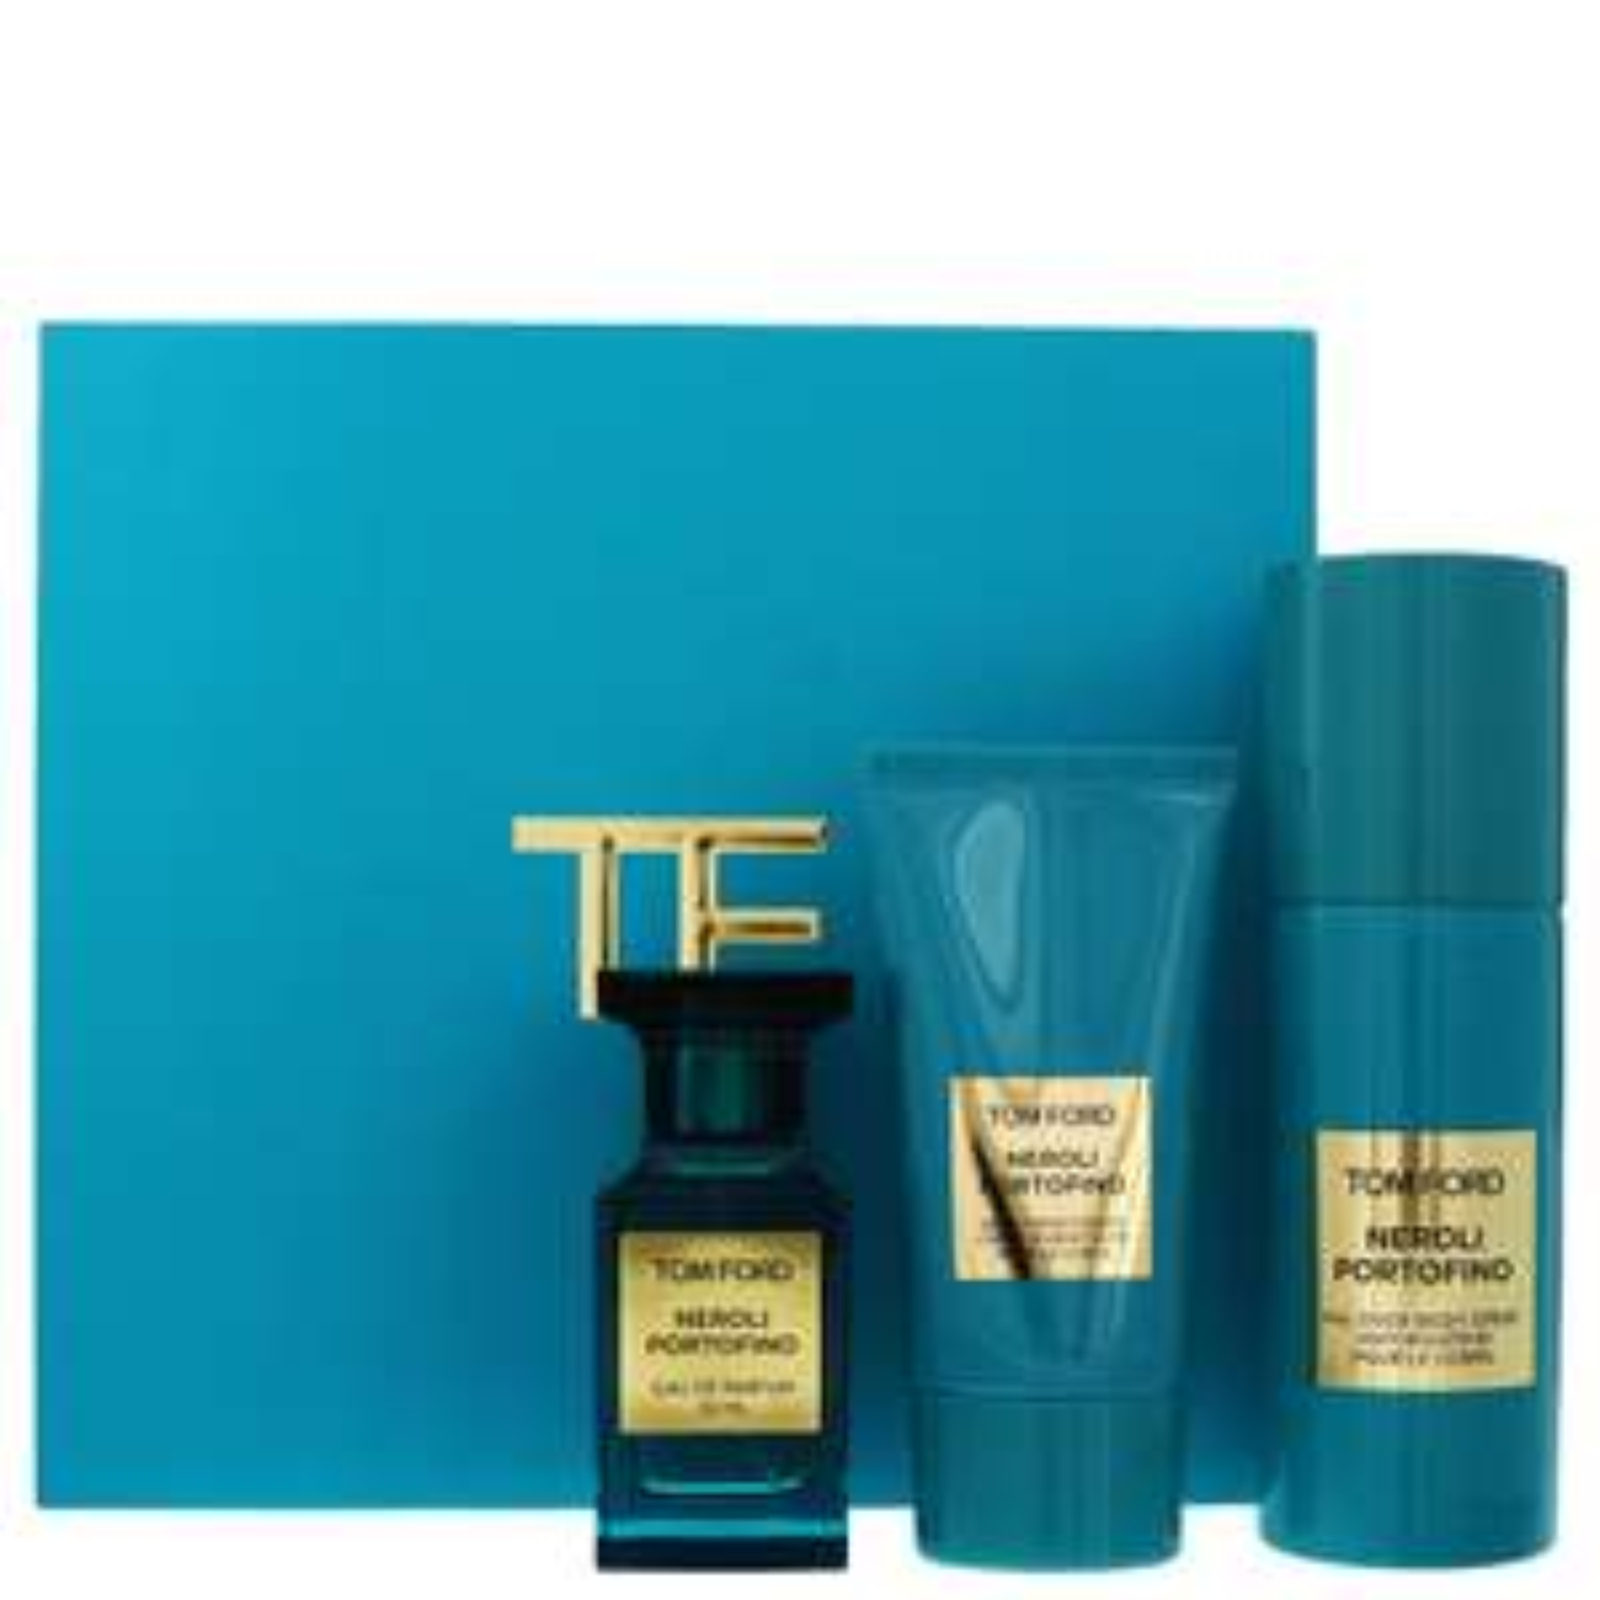 Tom Ford Neoroli Portofino 50ml EDP gift set £145.80 @ Allbeauty.com (£131 with 10% student beans discount)